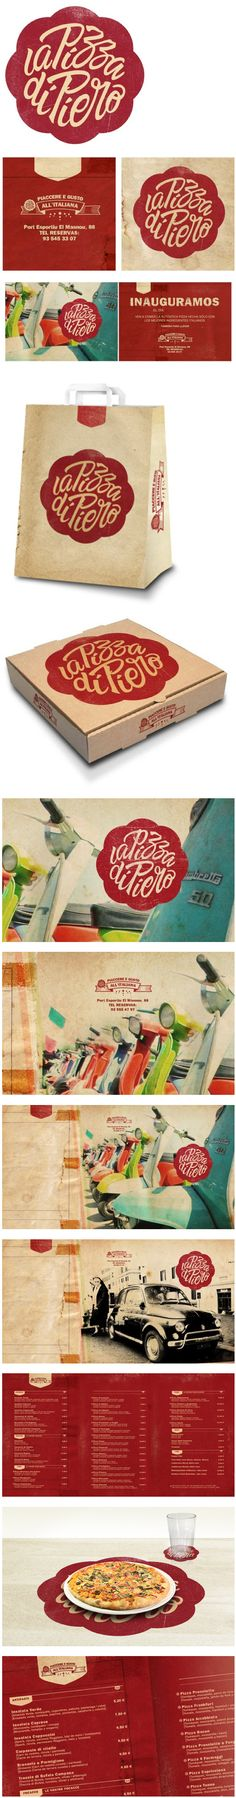 La Pizza de Piero branding by Alex Ramon. Great use of textures and color. Corporate Design, Brand Identity Design, Graphic Design Typography, Branding Design, Pizza Branding, Pizza Logo, Food Branding, Identity Branding, Corporate Identity